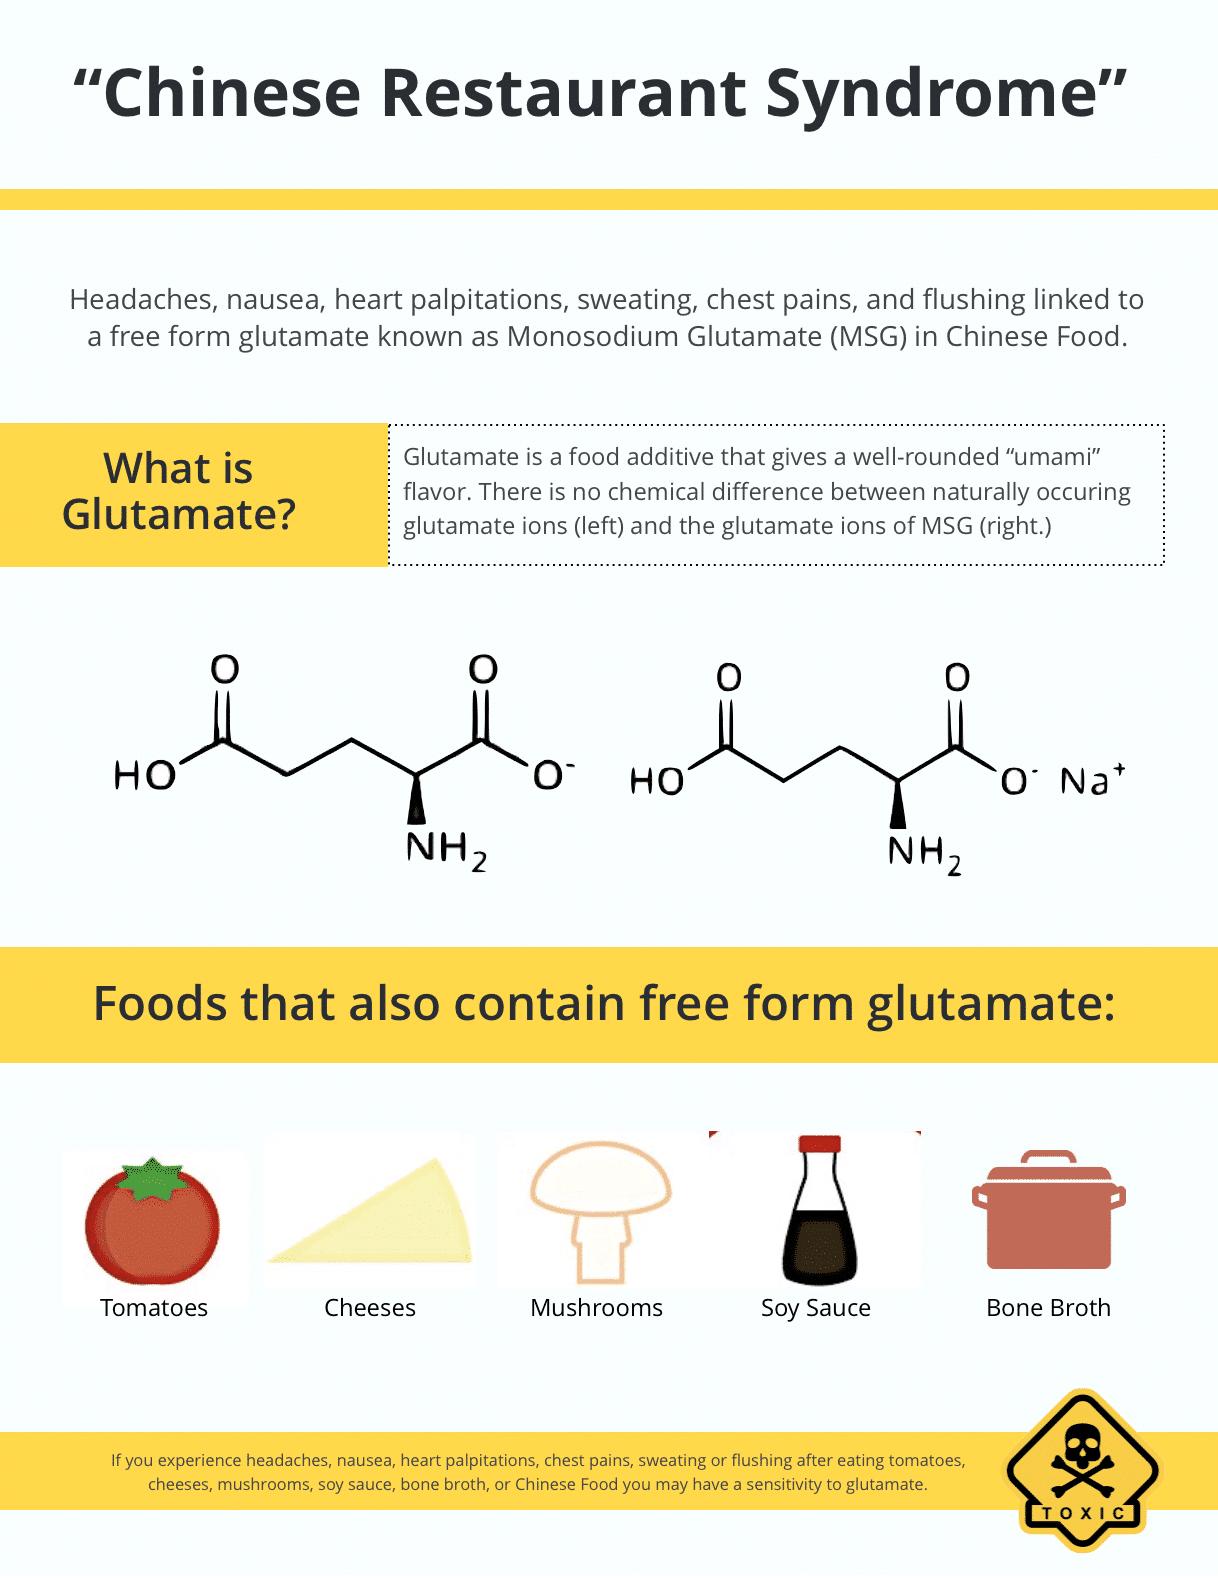 Monosodium Glutamate is msg bad for your health